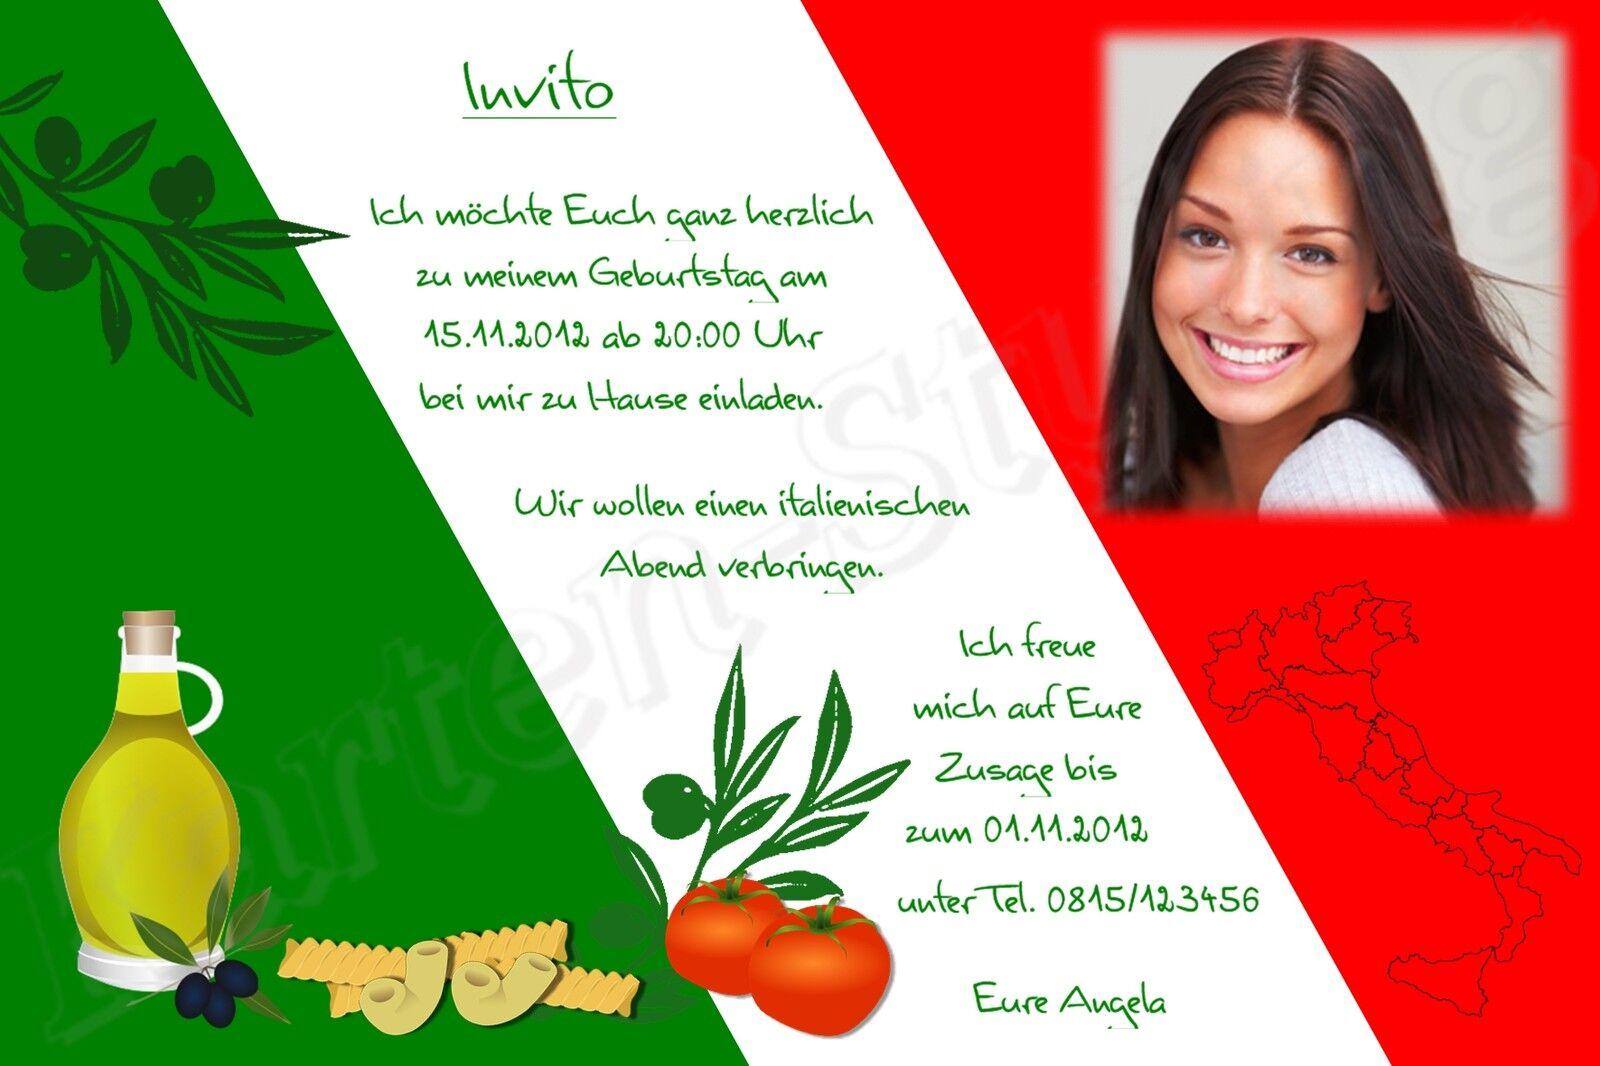 Einladung Geburtstag Party Feier Foto Karte Motto Mottofeier Italien gt_it